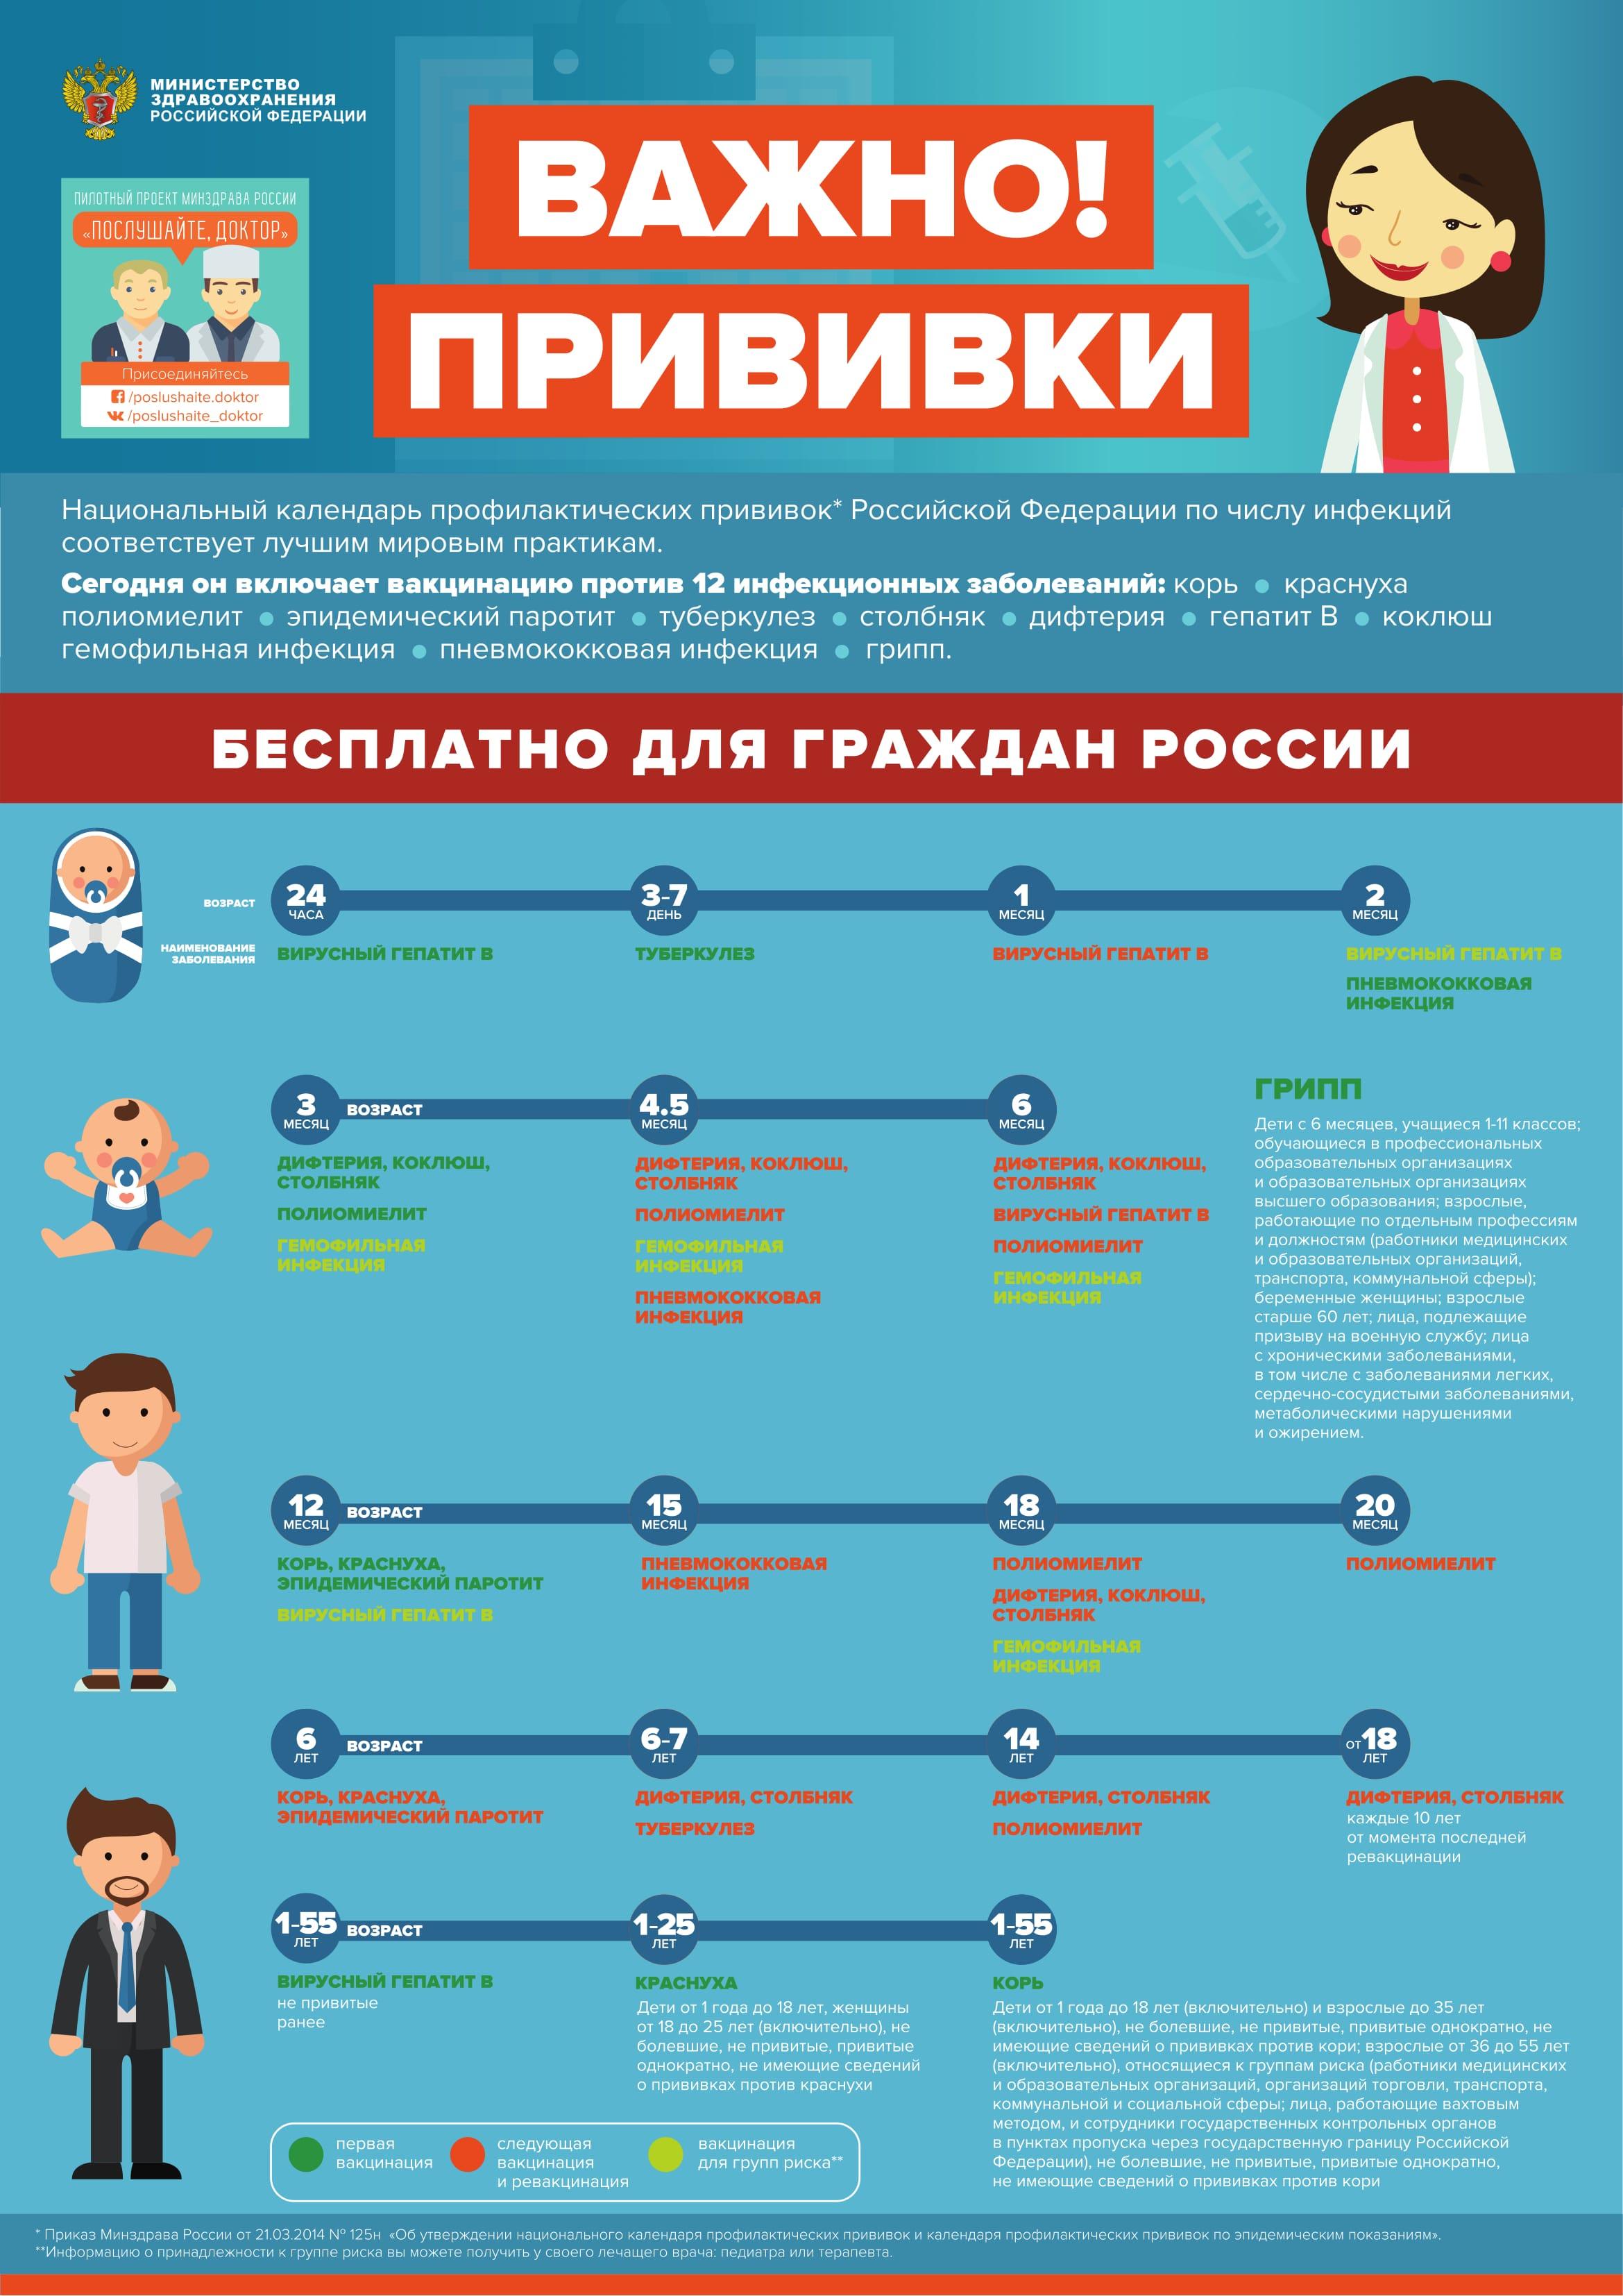 Сертификат о профилактических прививка Улица Щепкина москва справка 086у